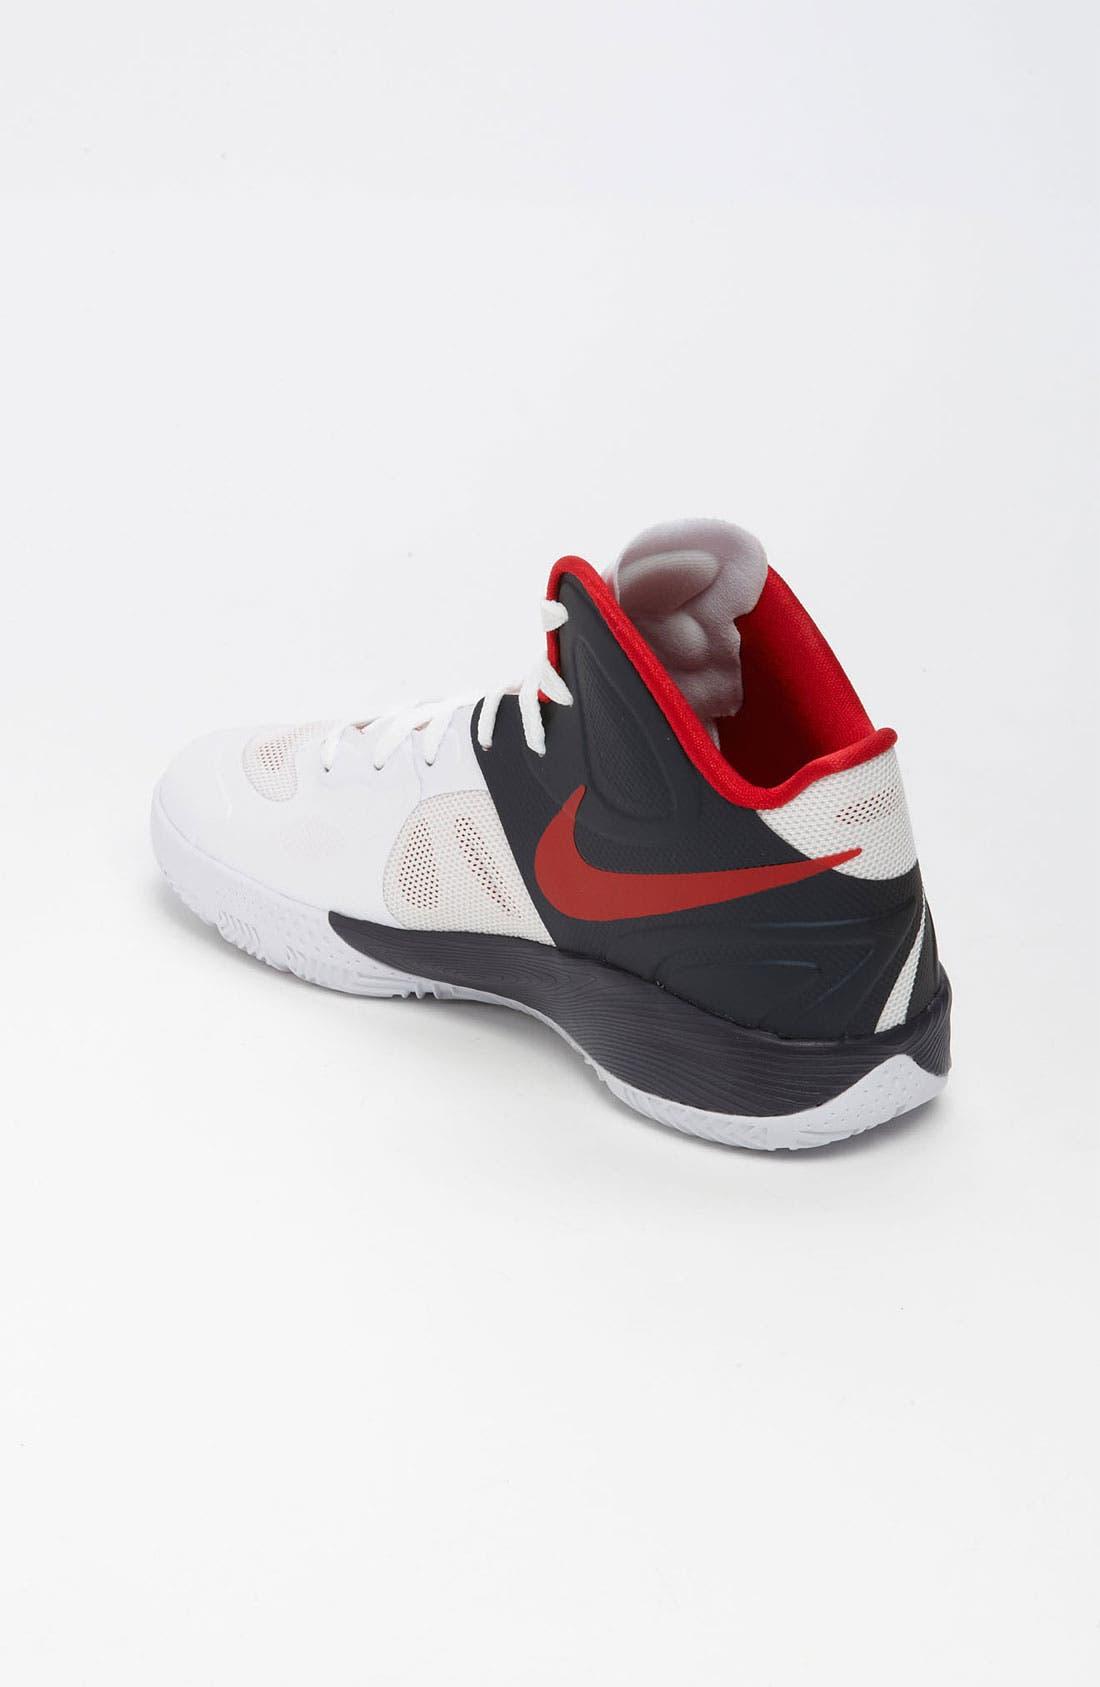 Alternate Image 2  - Nike 'Hyperfuse 2012' Basketball Shoe (Big Kid)